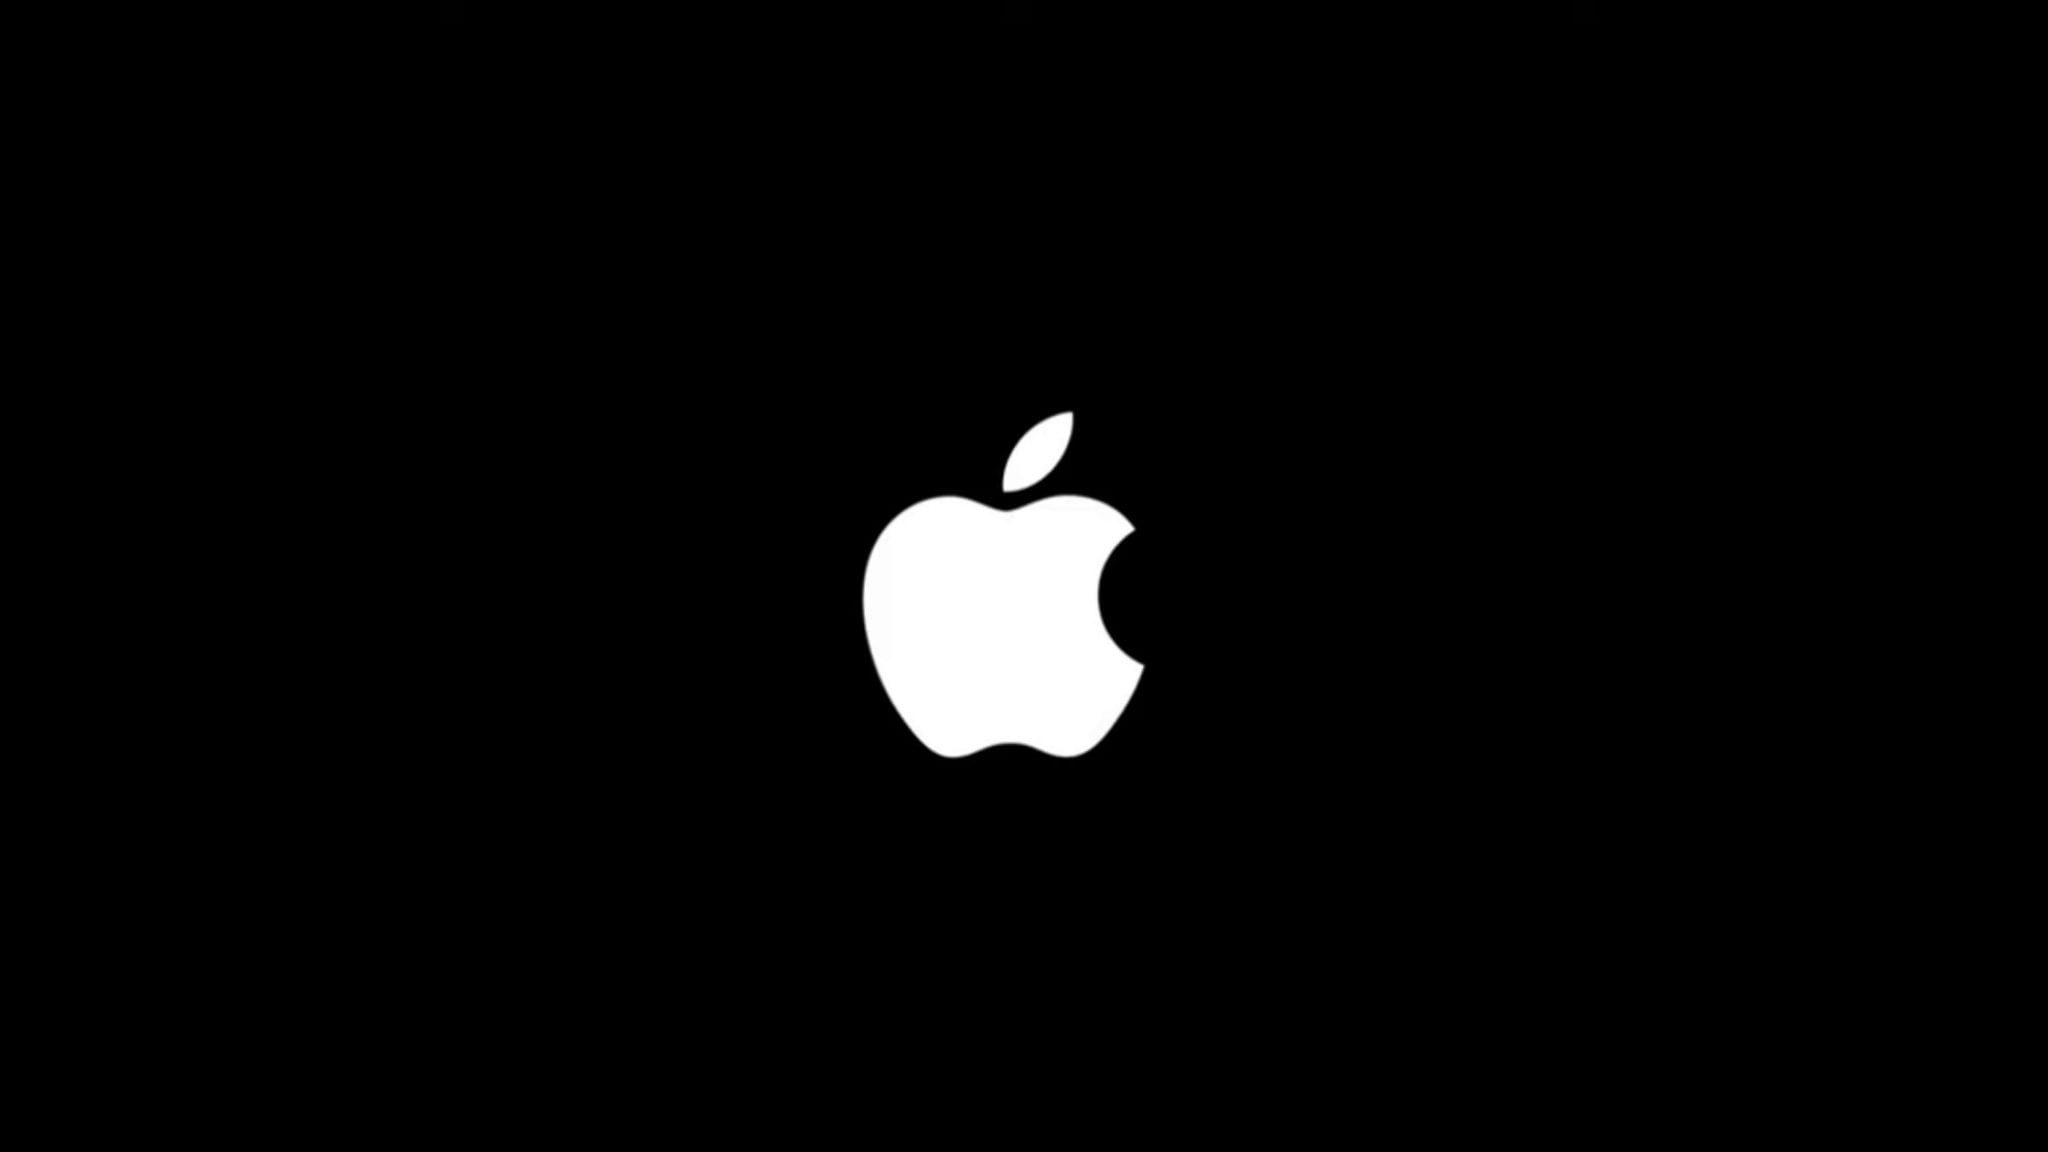 Apple Event Transcript October 13: iPhone 12 Release